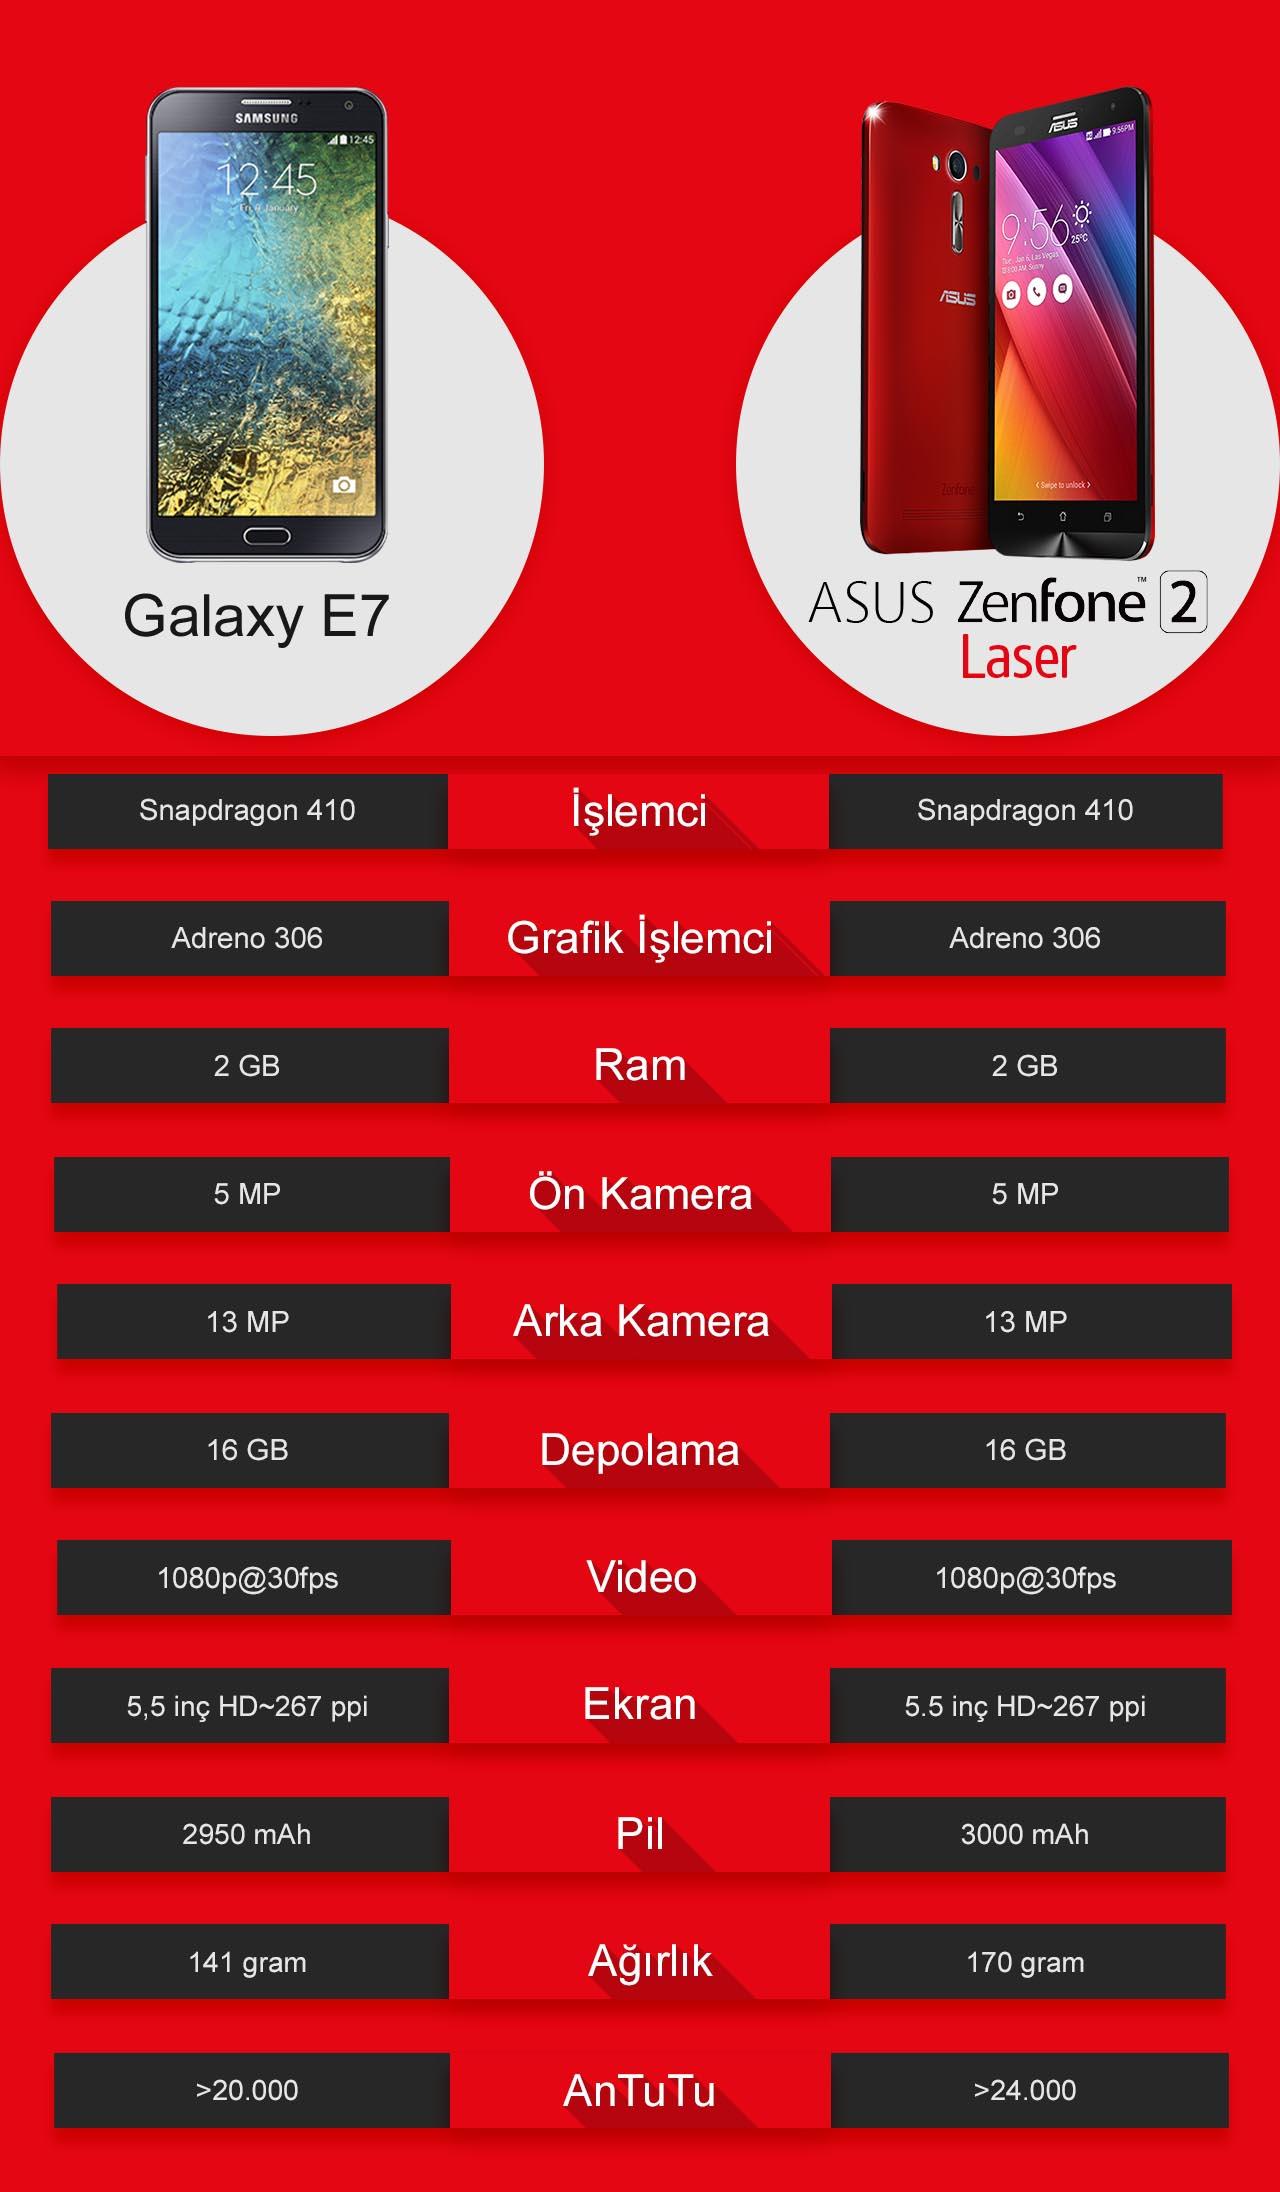 asus_zenfone_2_laser_vs_samsung_galaxy_e7_karşılaştırma